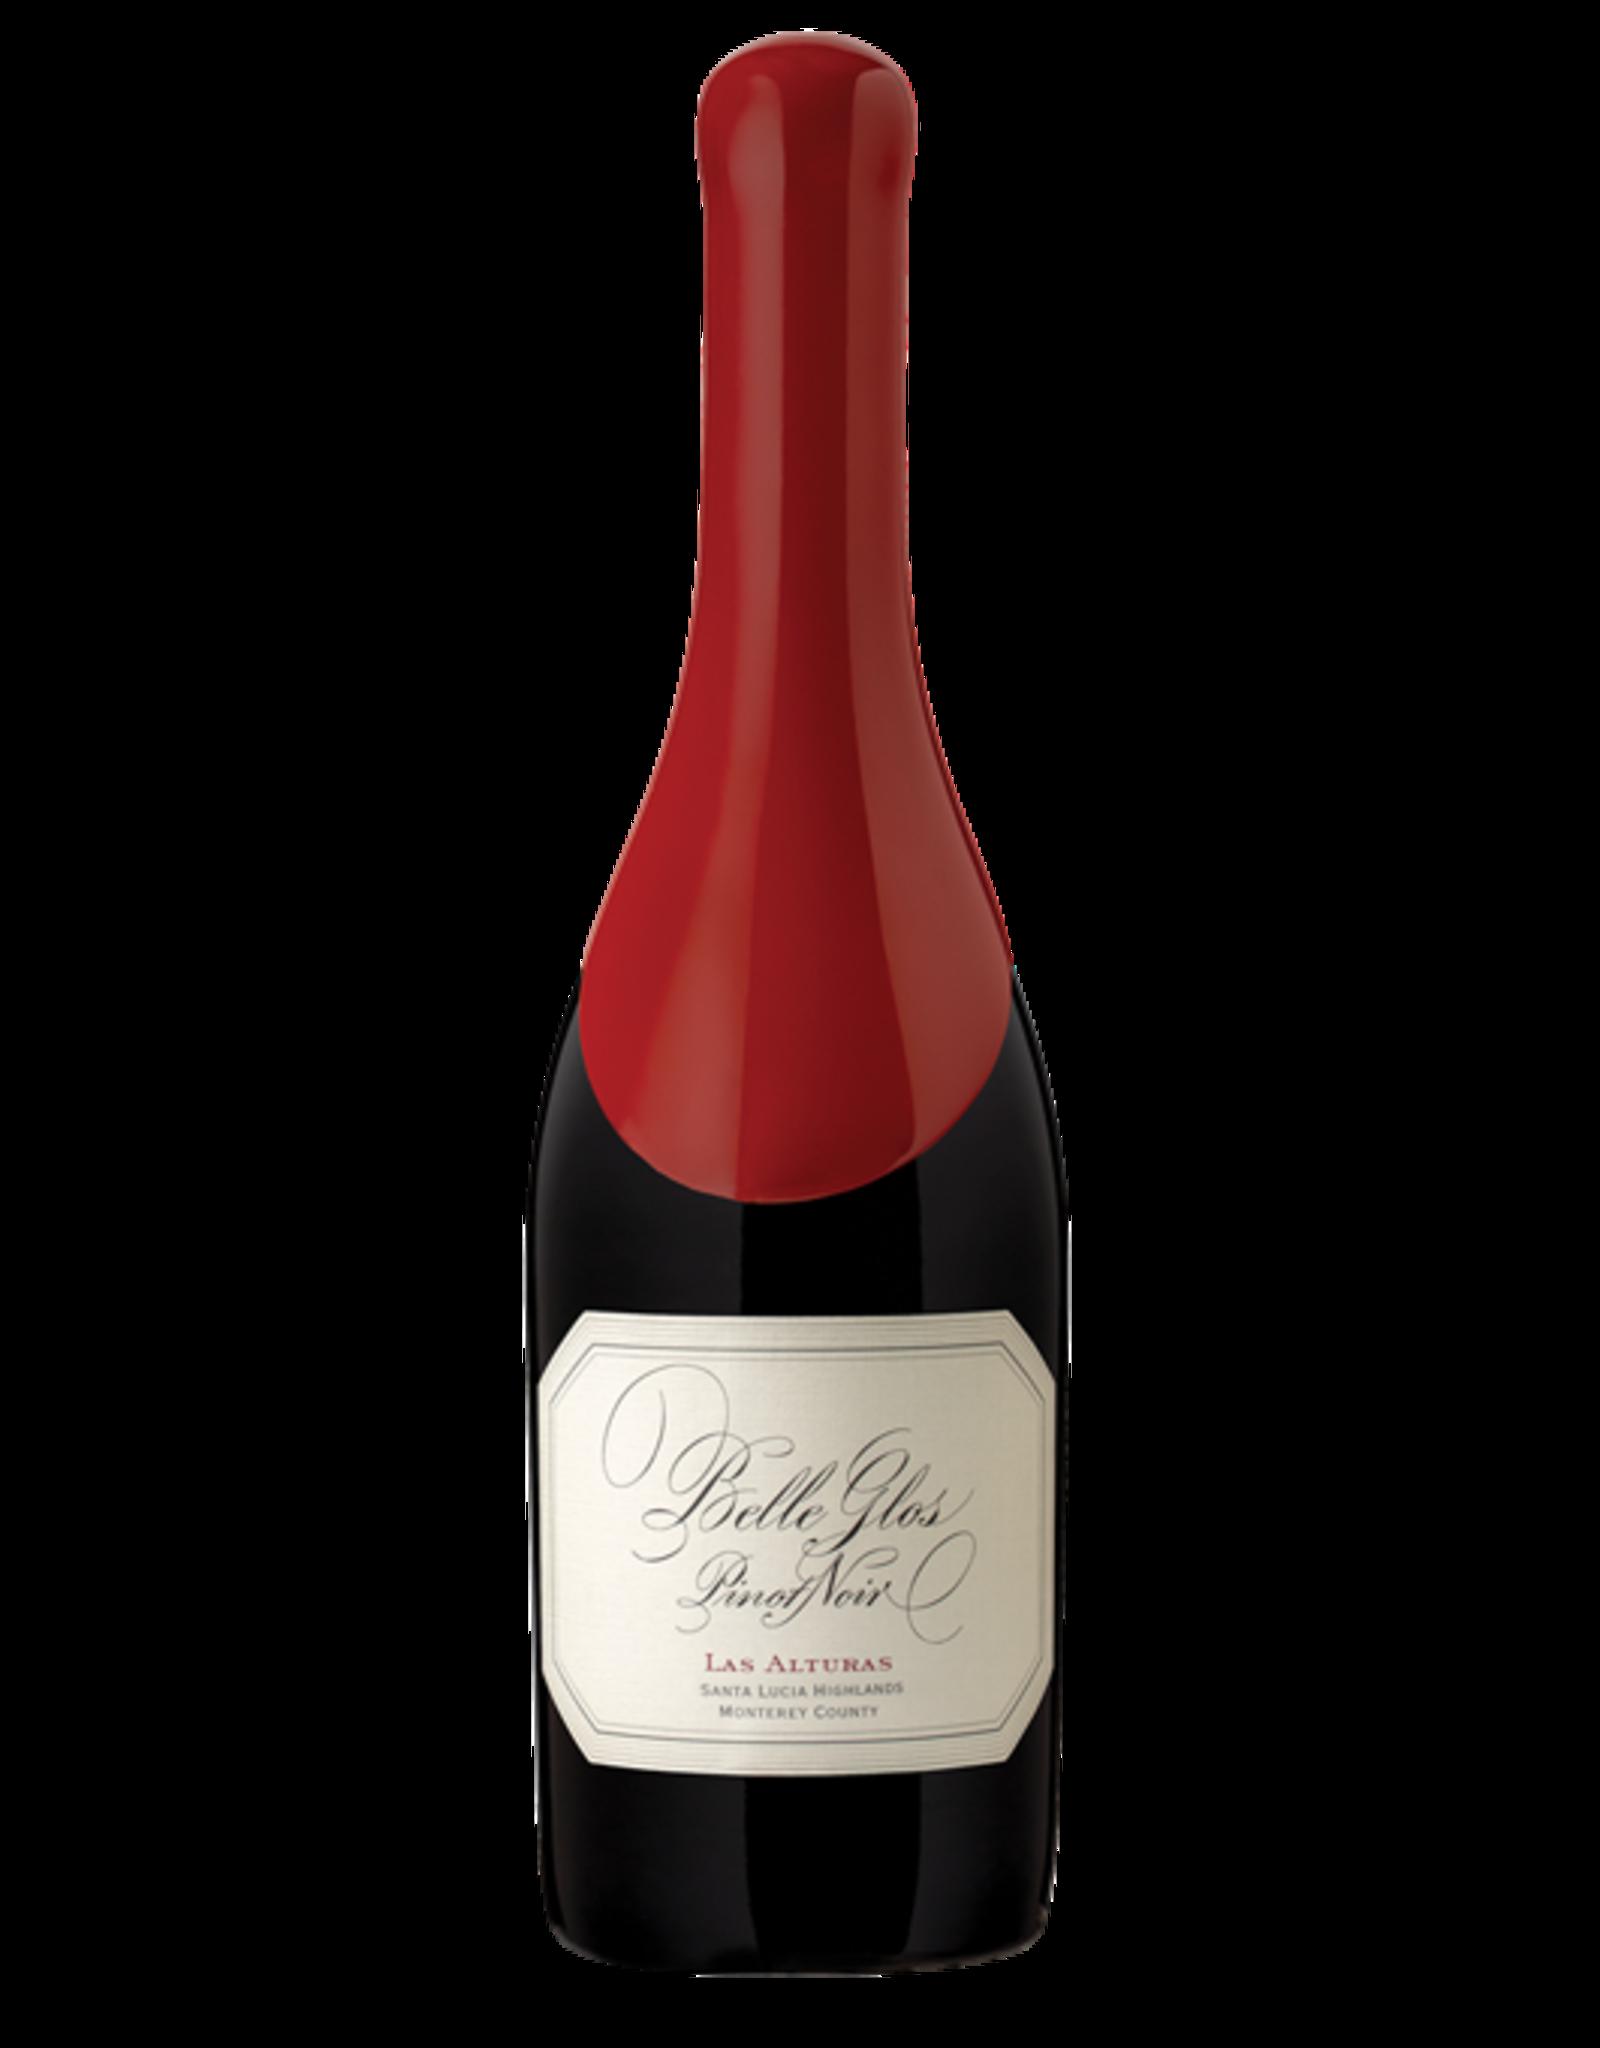 Belle Glos Las Alturas Pinot Noir 2018